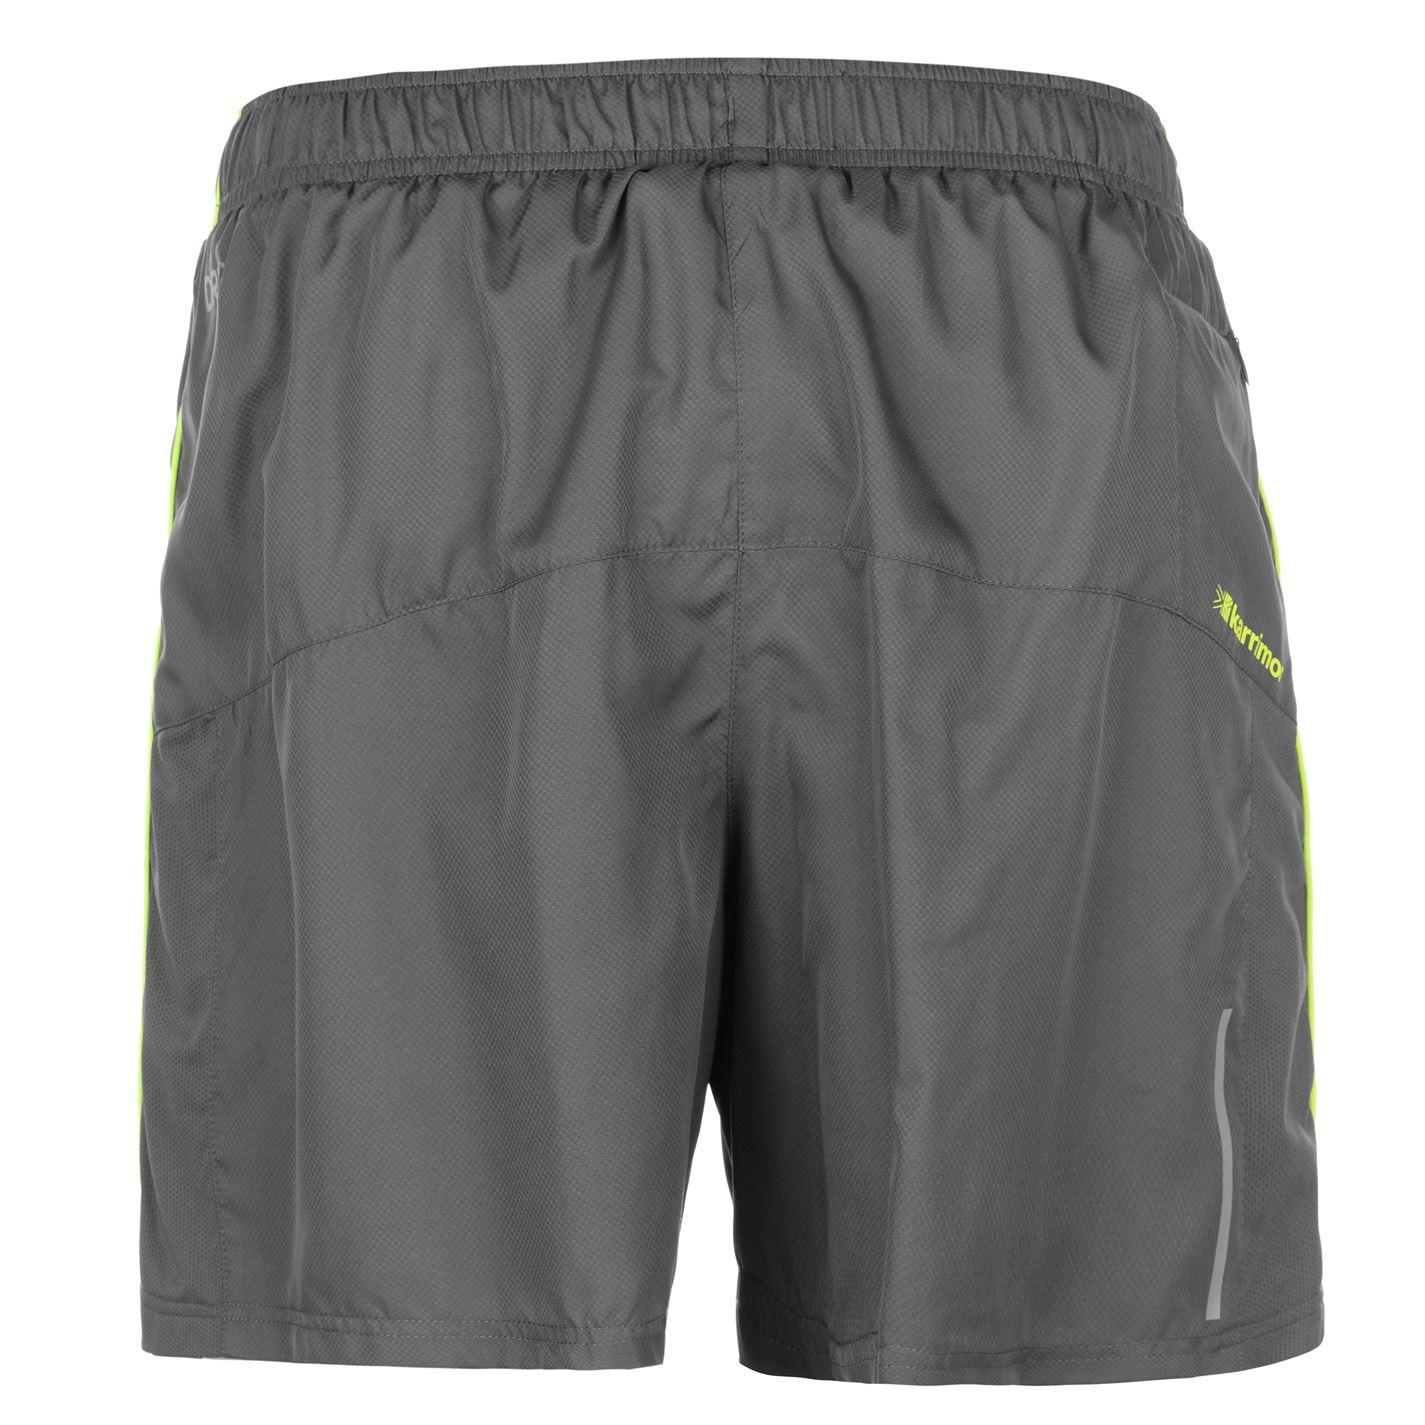 Karrimor-Xlite-5inch-Running-Shorts-Performance-Mens thumbnail 18